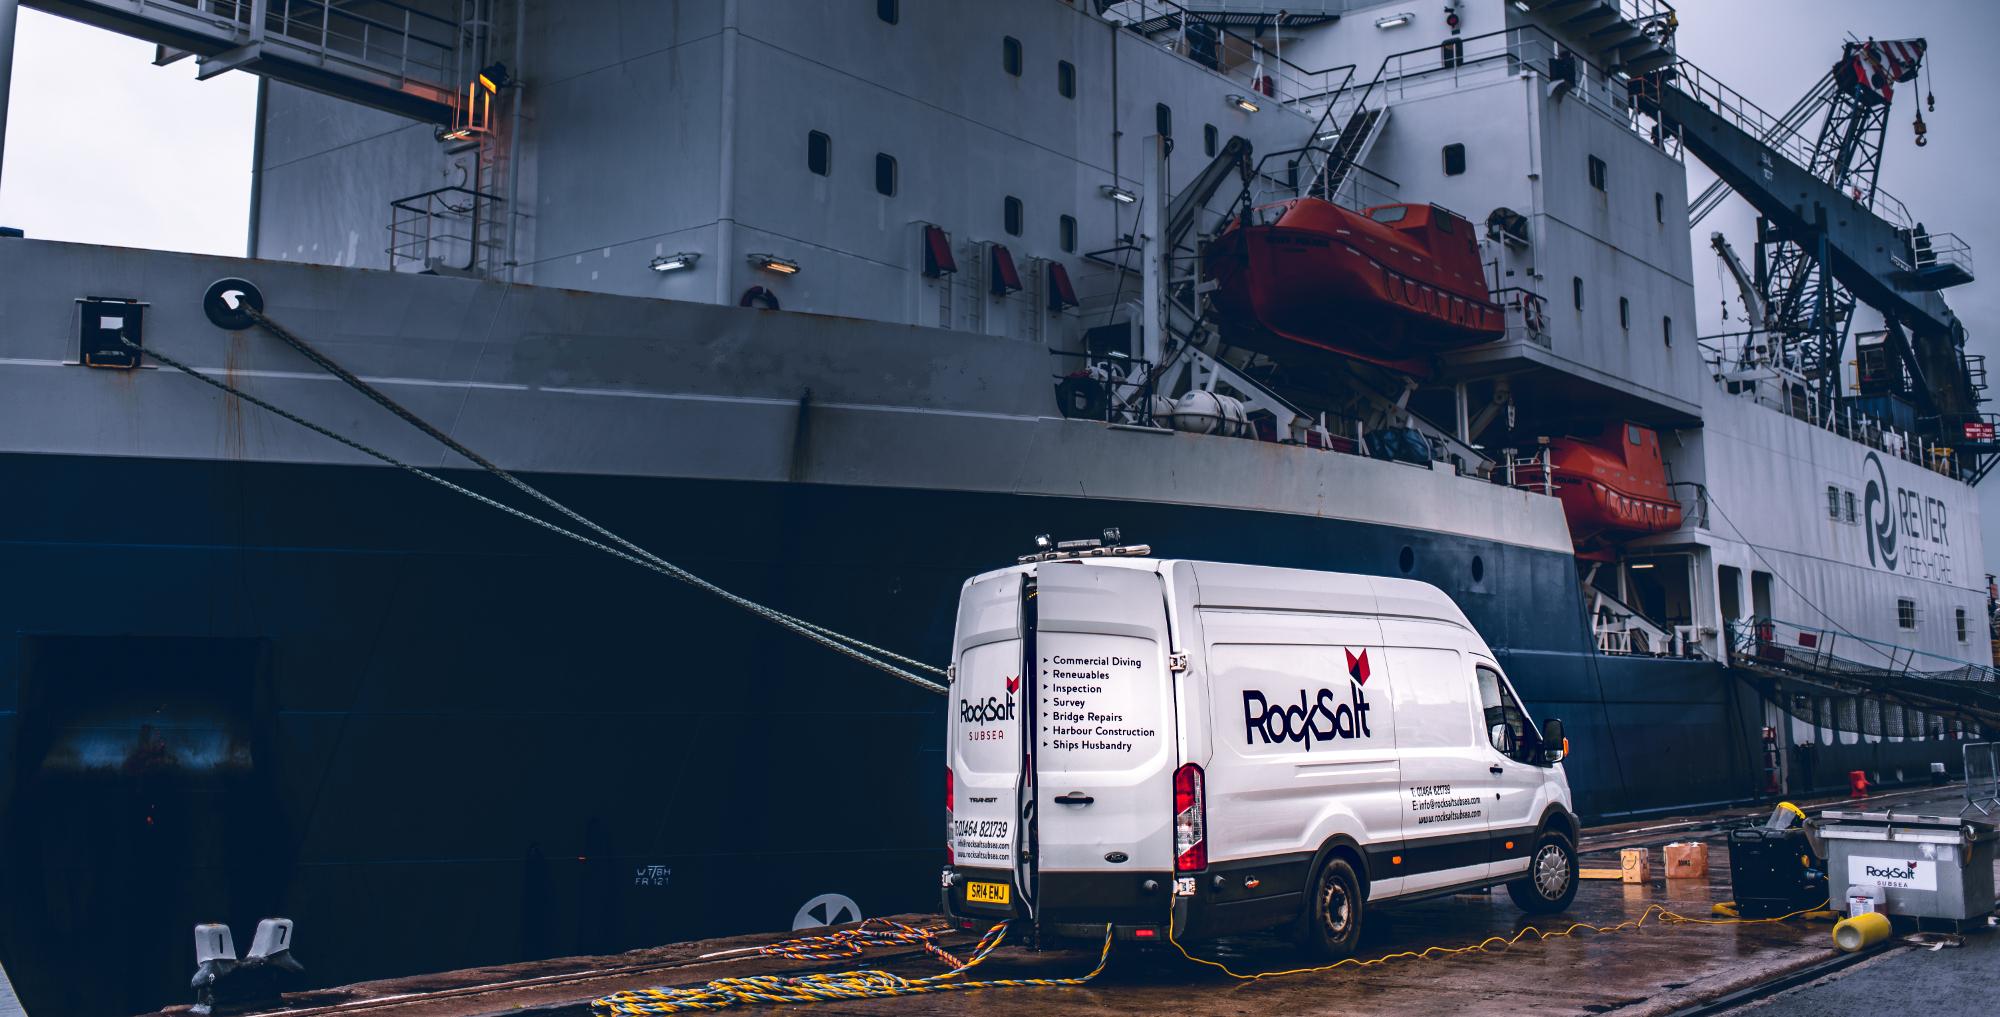 RockSalt Subsea Diving Systems